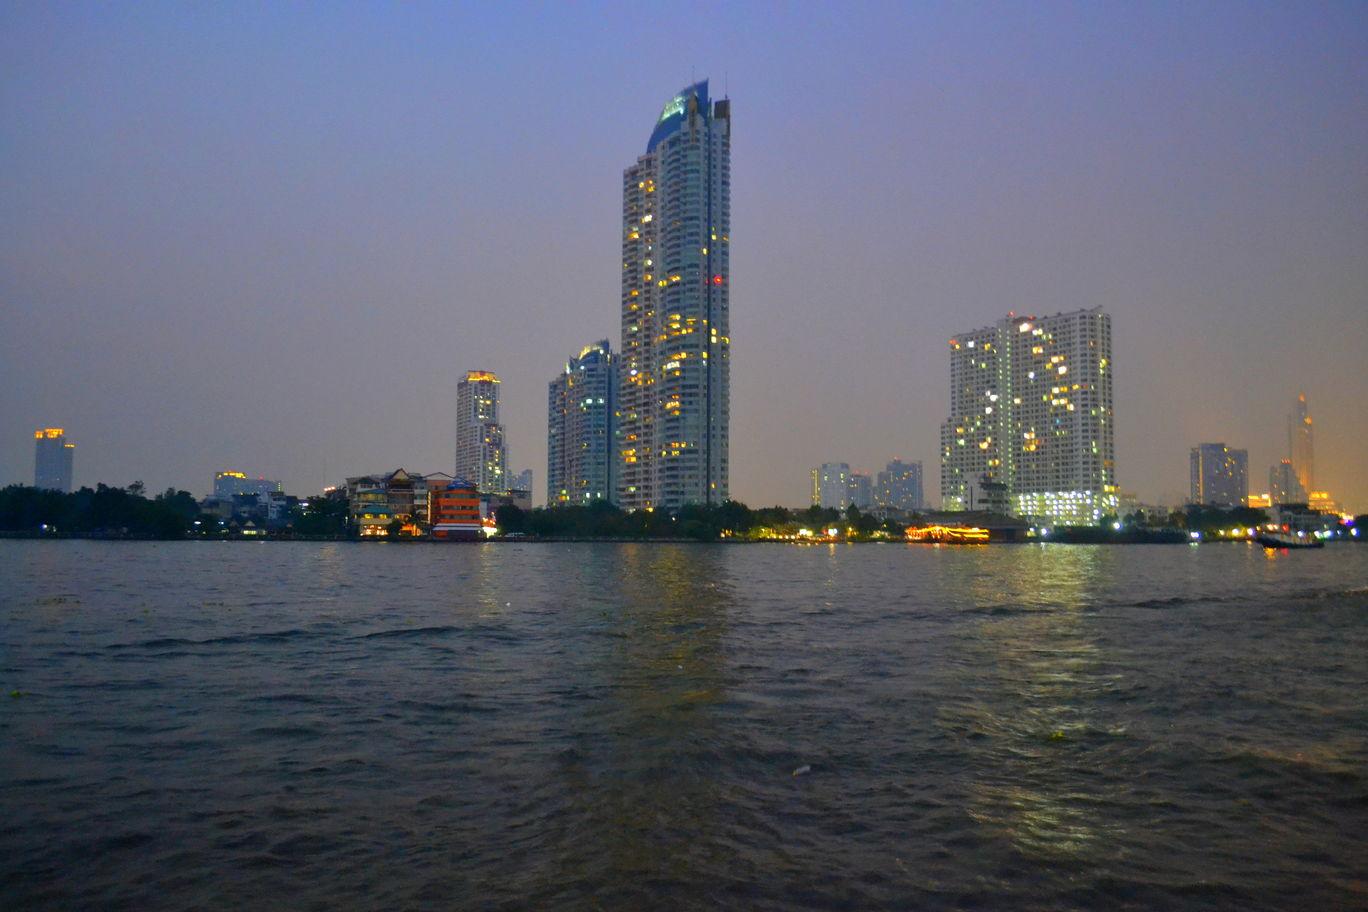 Photo of ASIATIQUE The Riverfront By Karthik Gandhi aka GastroHogger